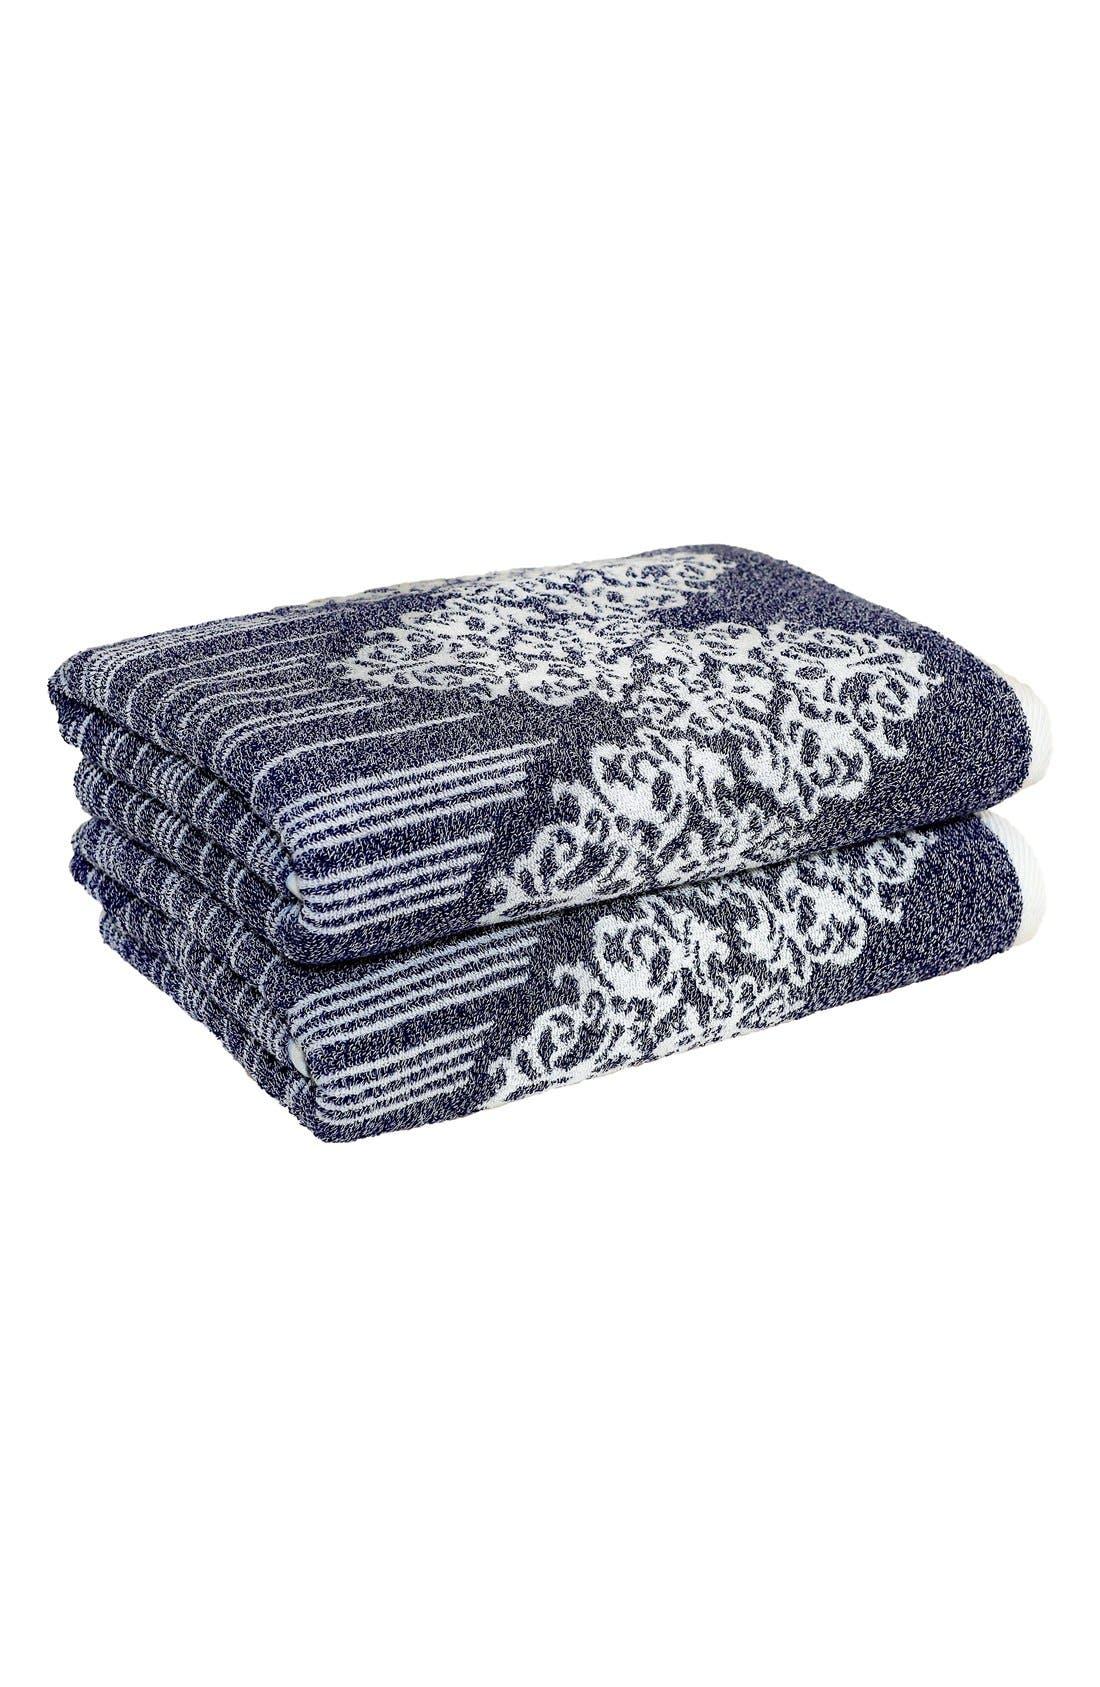 Main Image - Linum 'Gioia' Turkish Cotton Bath Towels (Set of 2)